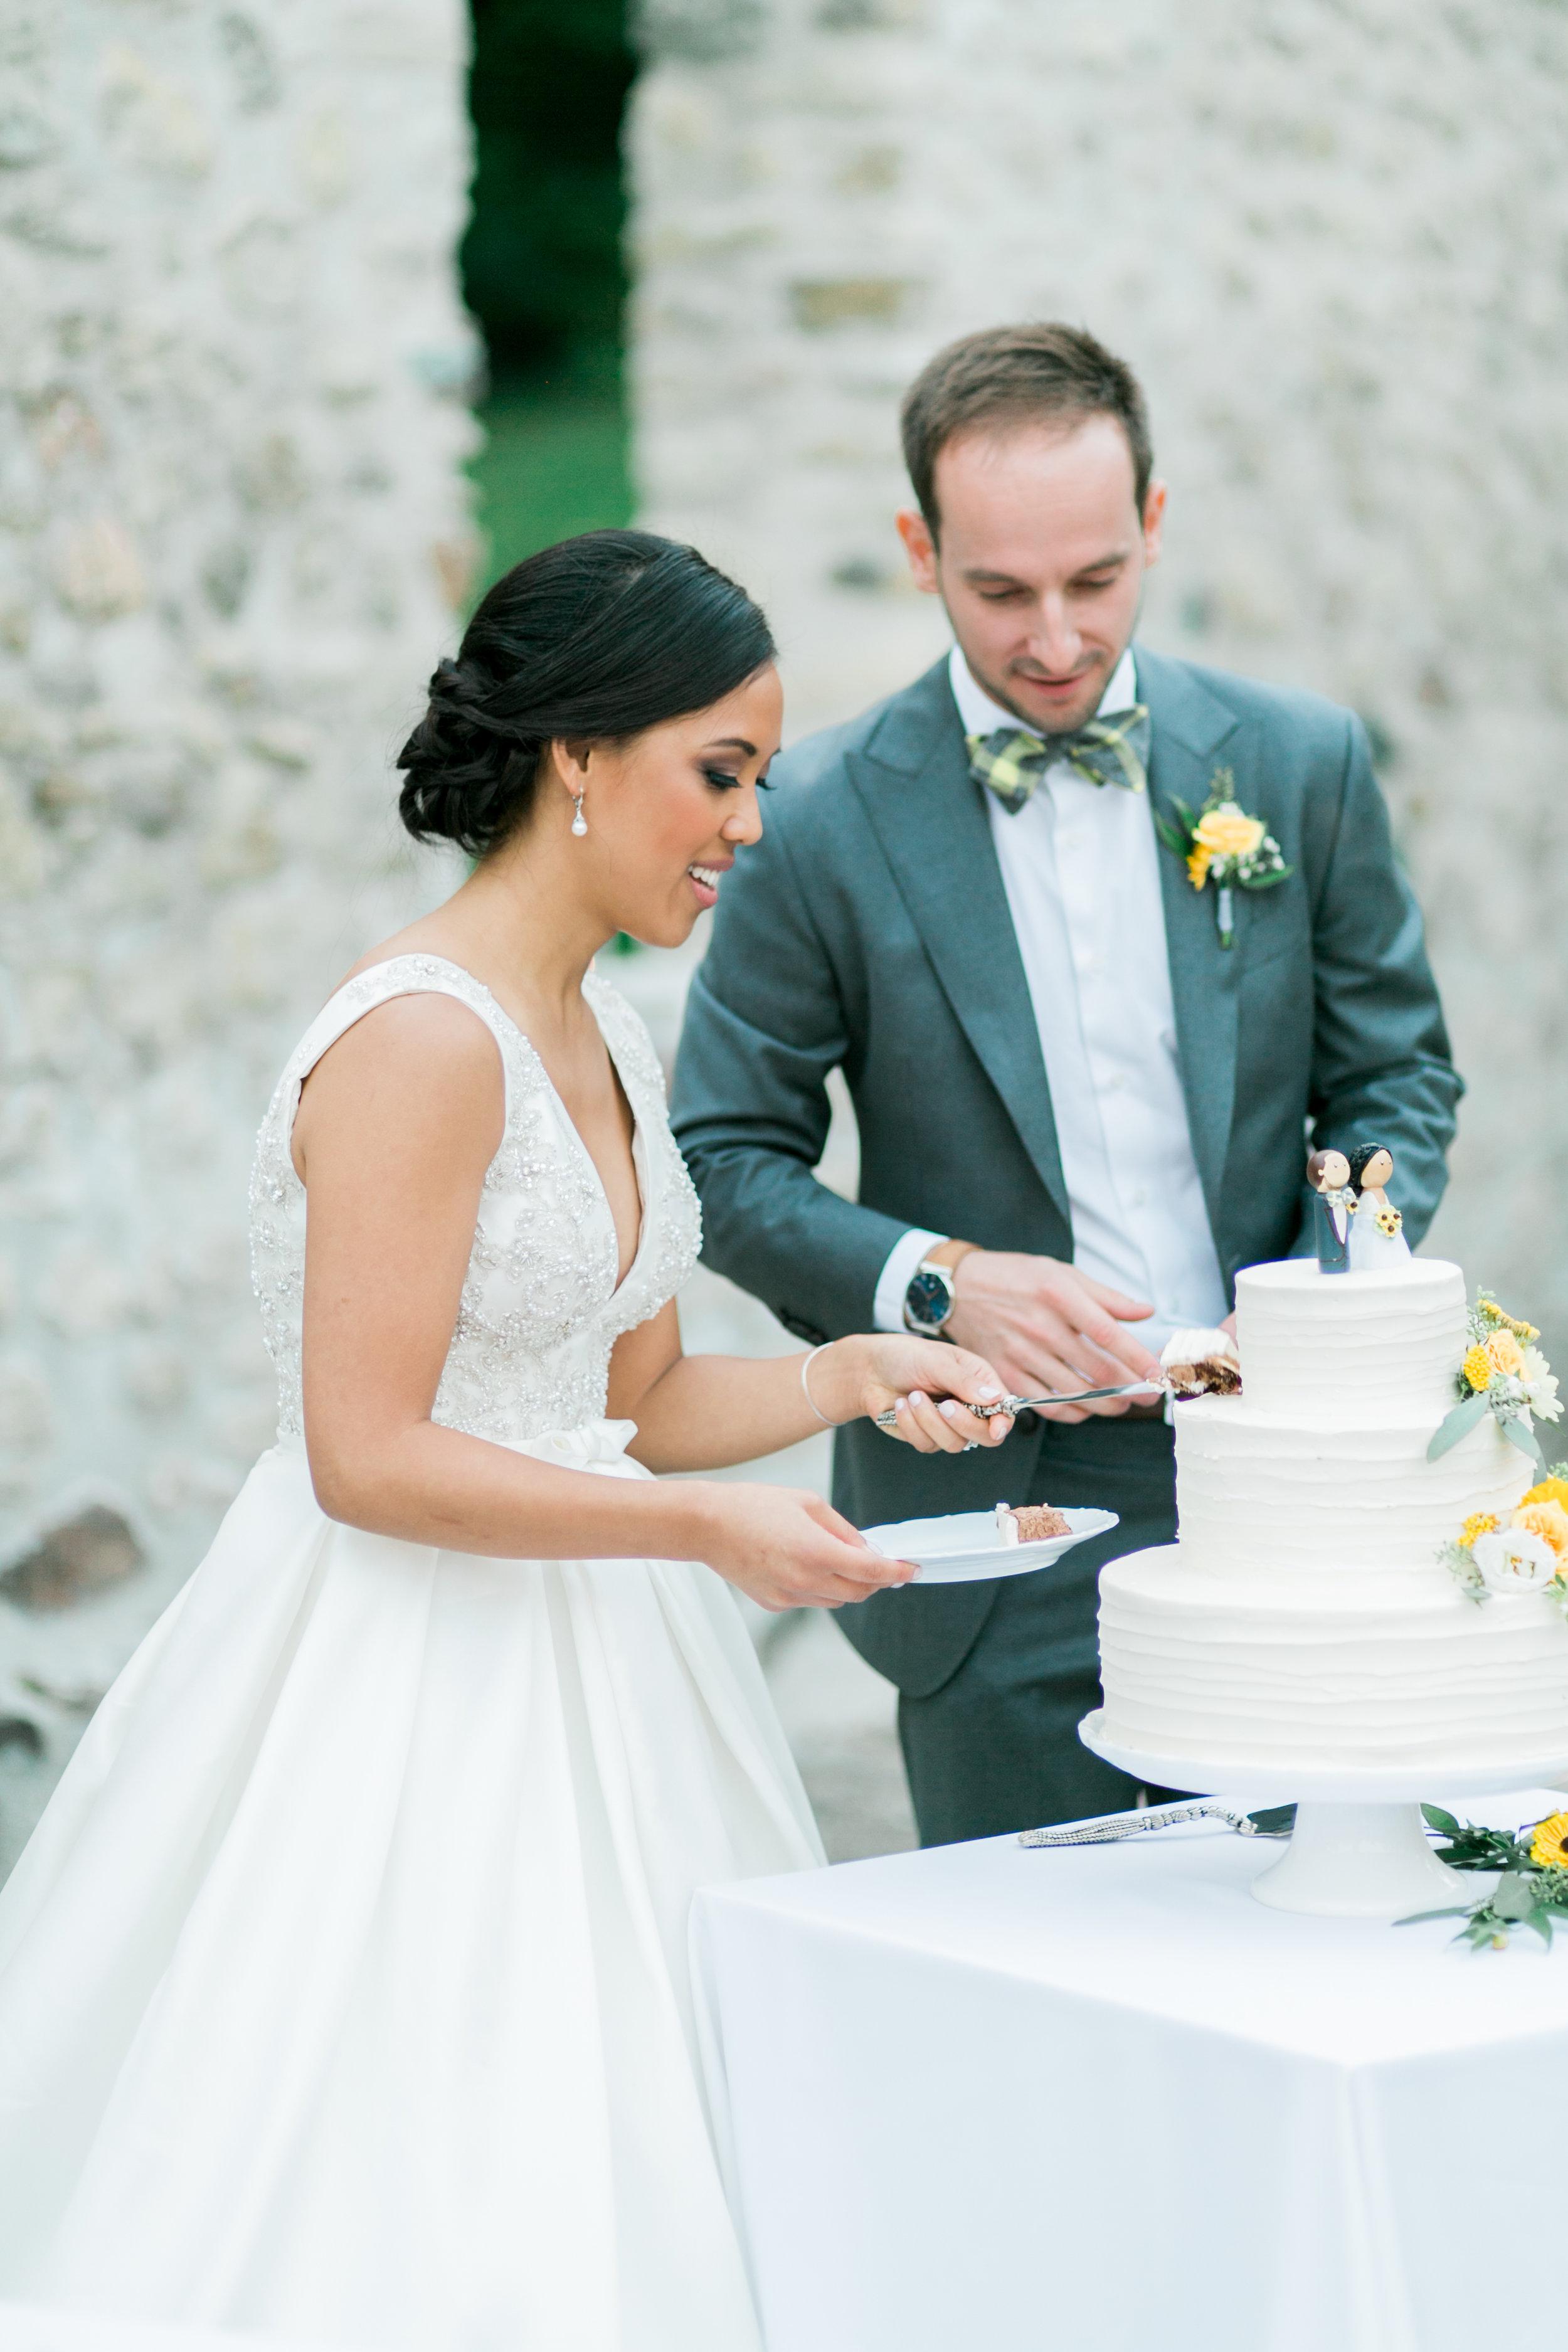 Alton Mills Wedding - Reception-74.jpg